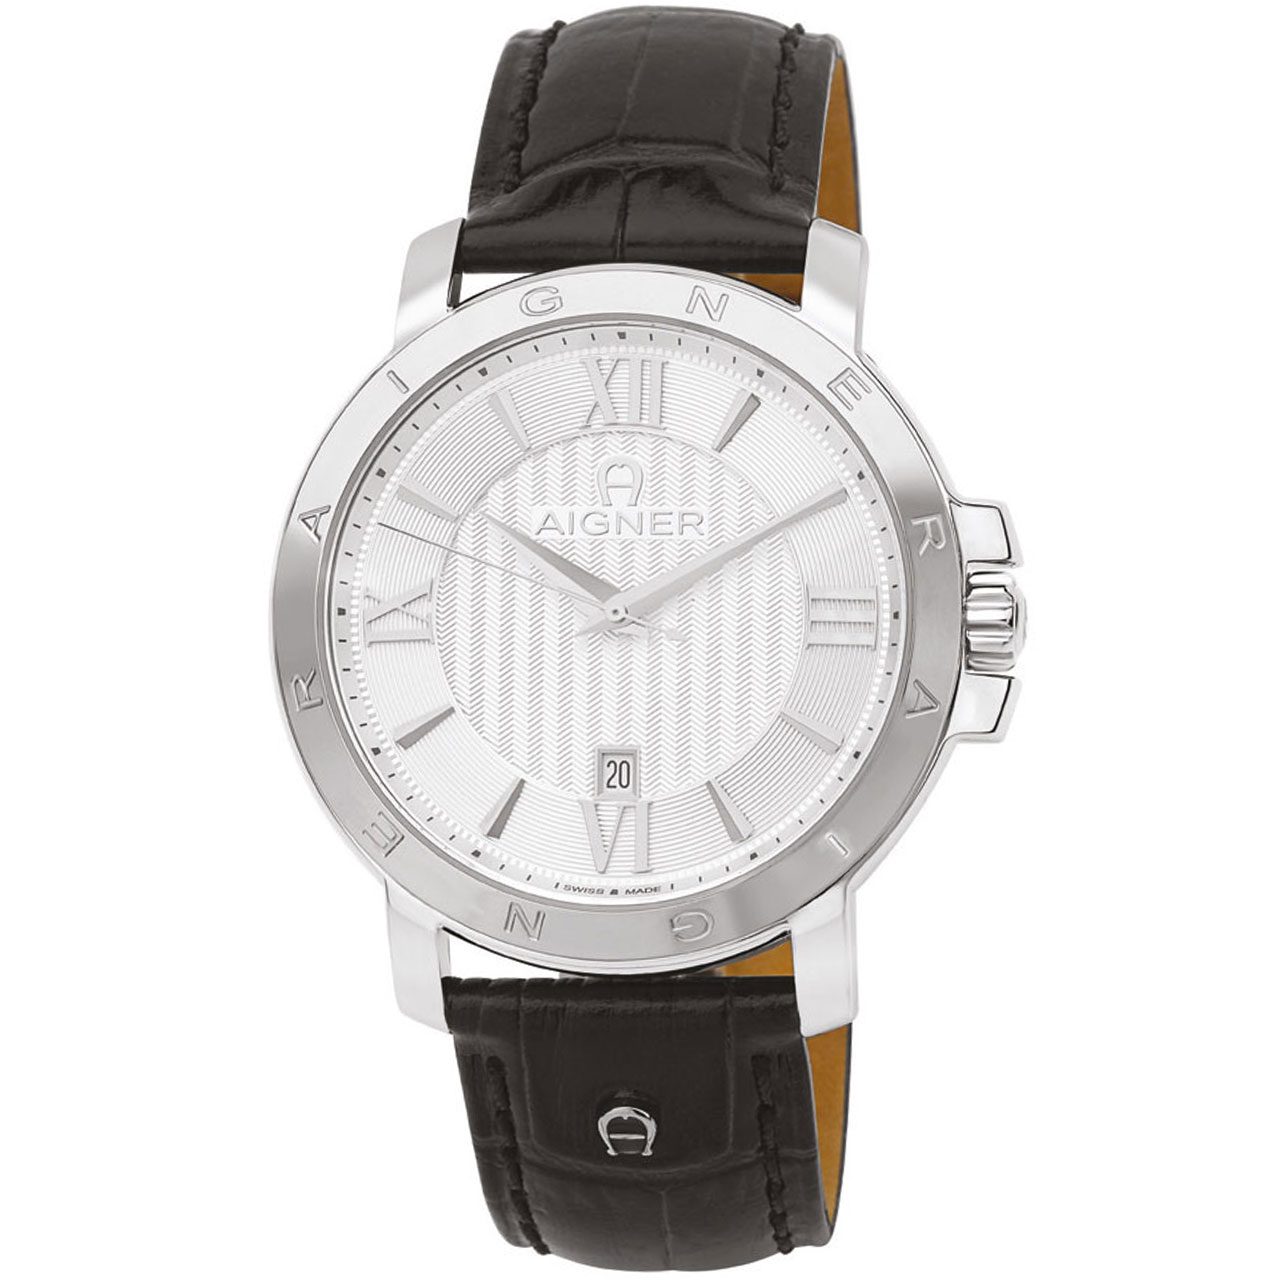 ساعت مچی عقربه ای مردانه اگنر مدل A09015 12